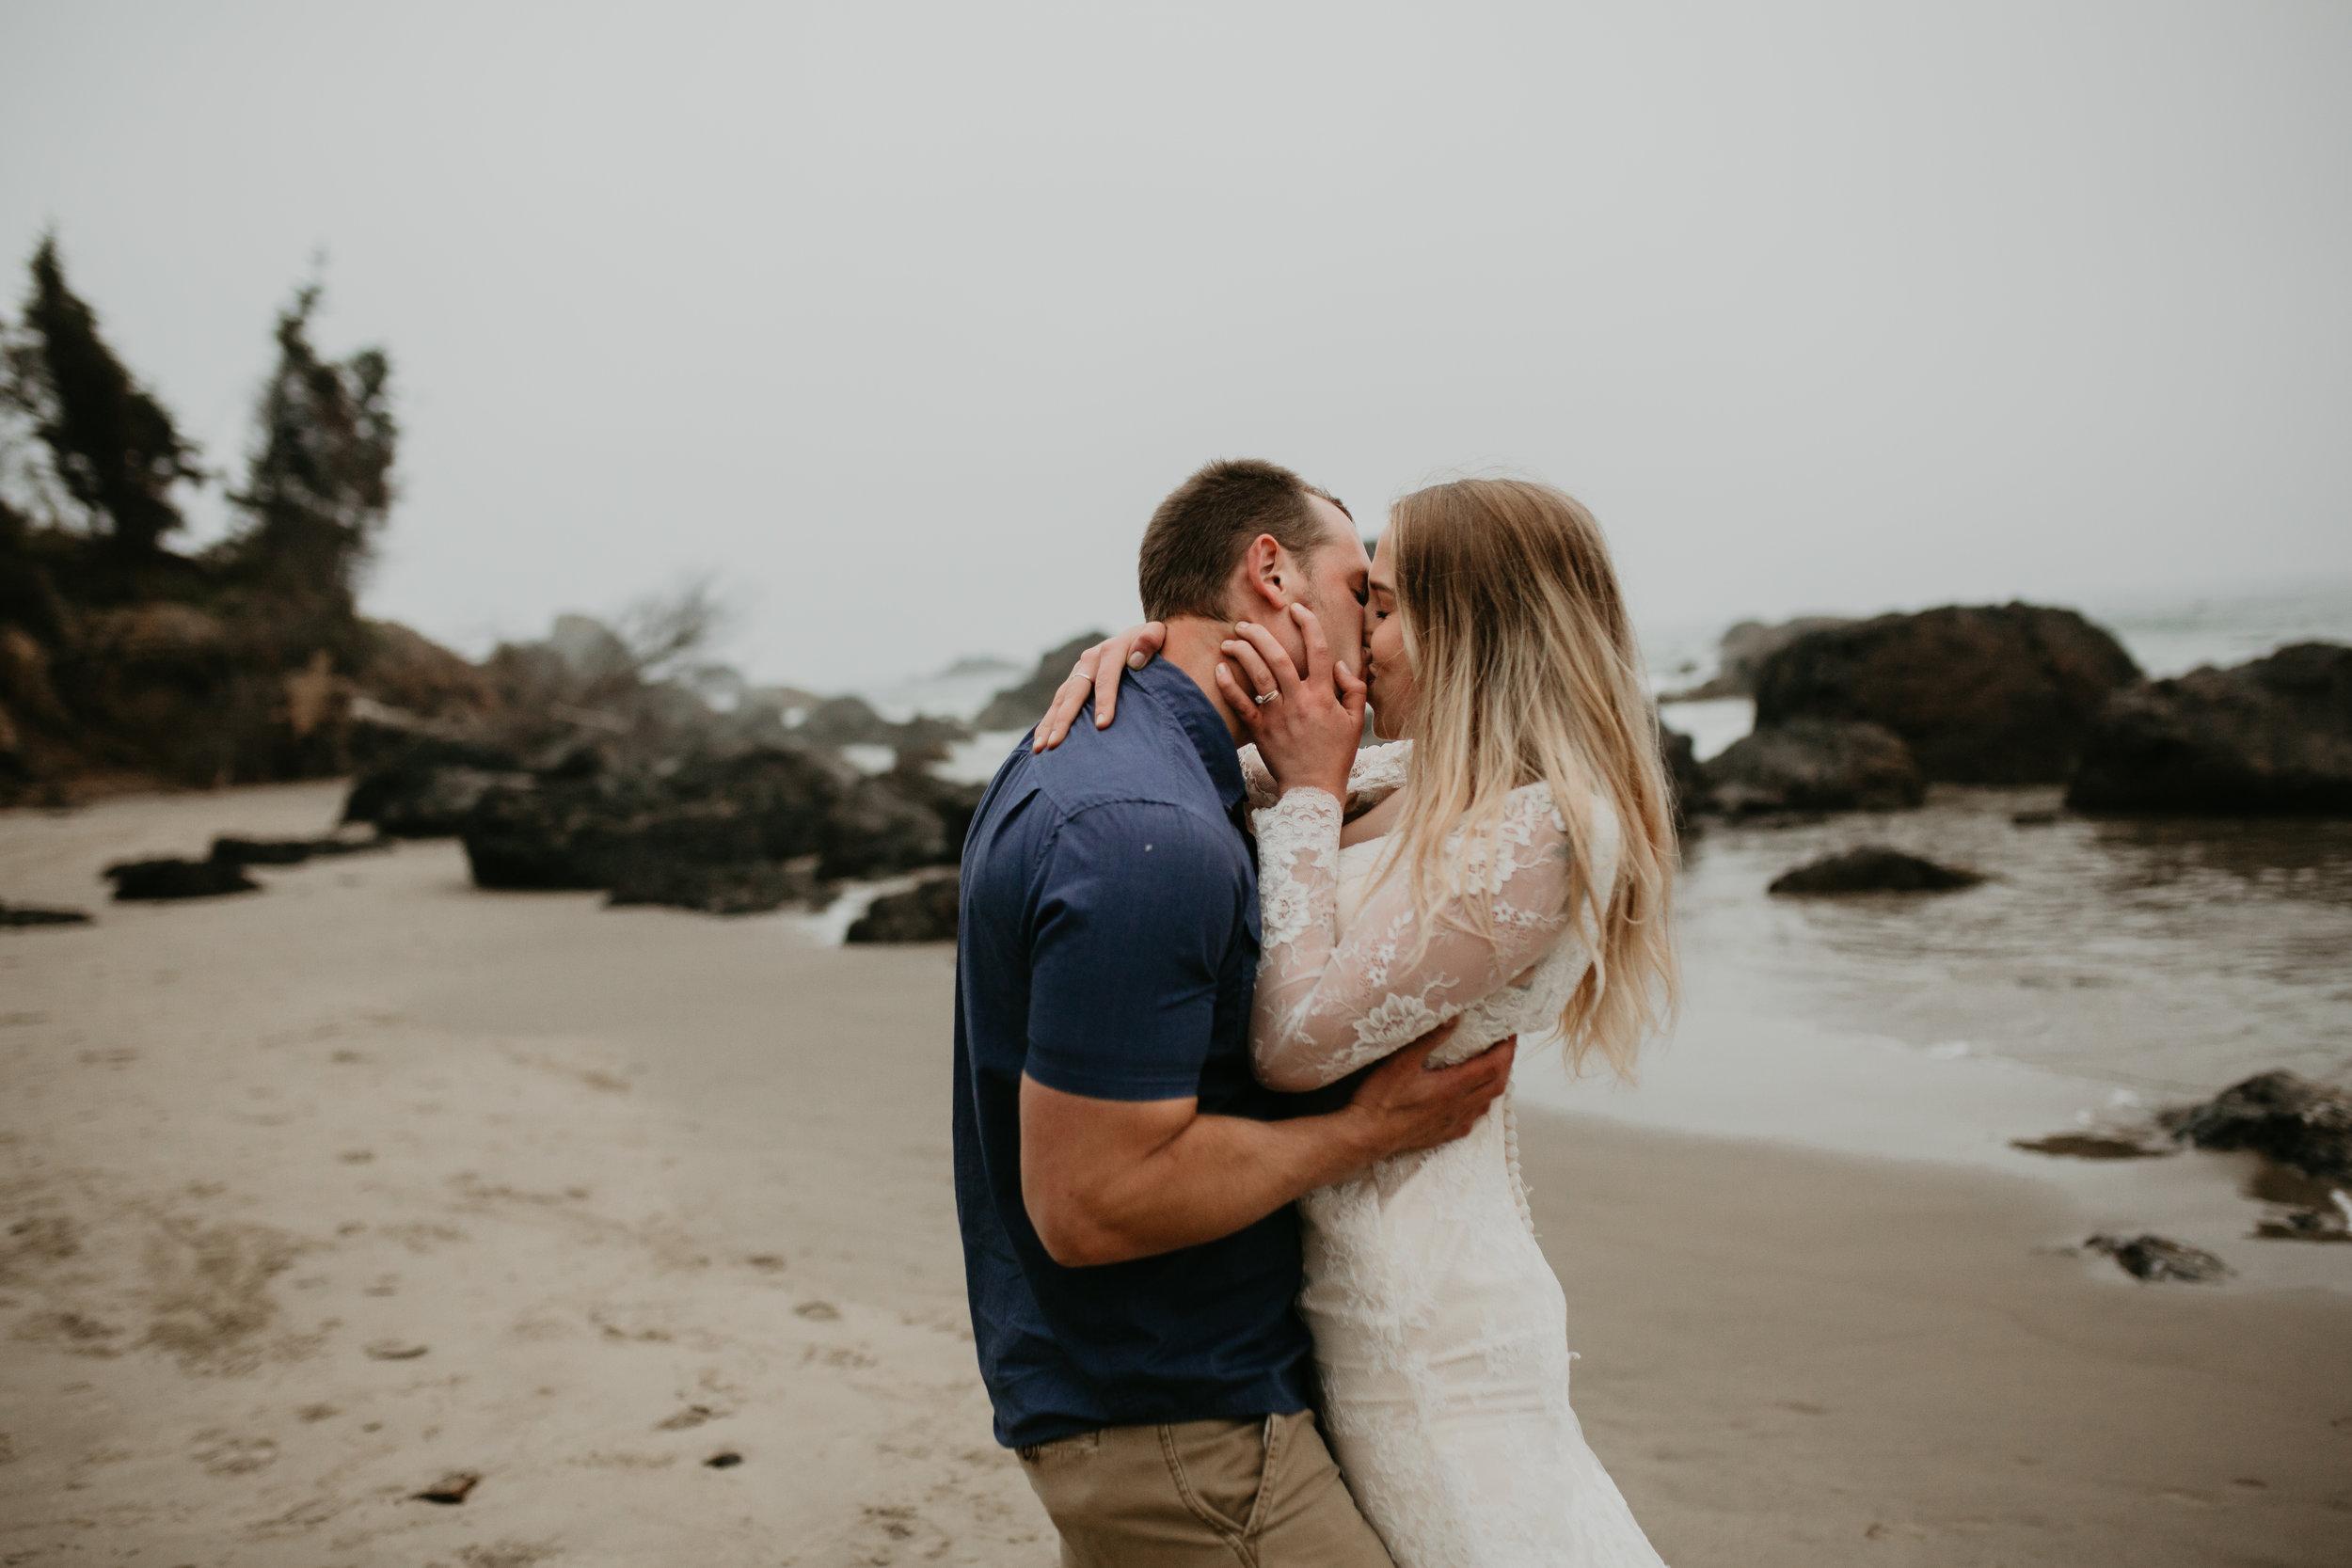 nicole-daacke-photography-ecola-state-park-oregon-elopement-bridal-photos-photographer-for-cannon-beach-elopement-oregon-coast-elopement-photographer-foggy-summer-elopement-cannon-beach-best-adventure-elopement-photographer-7106.jpg